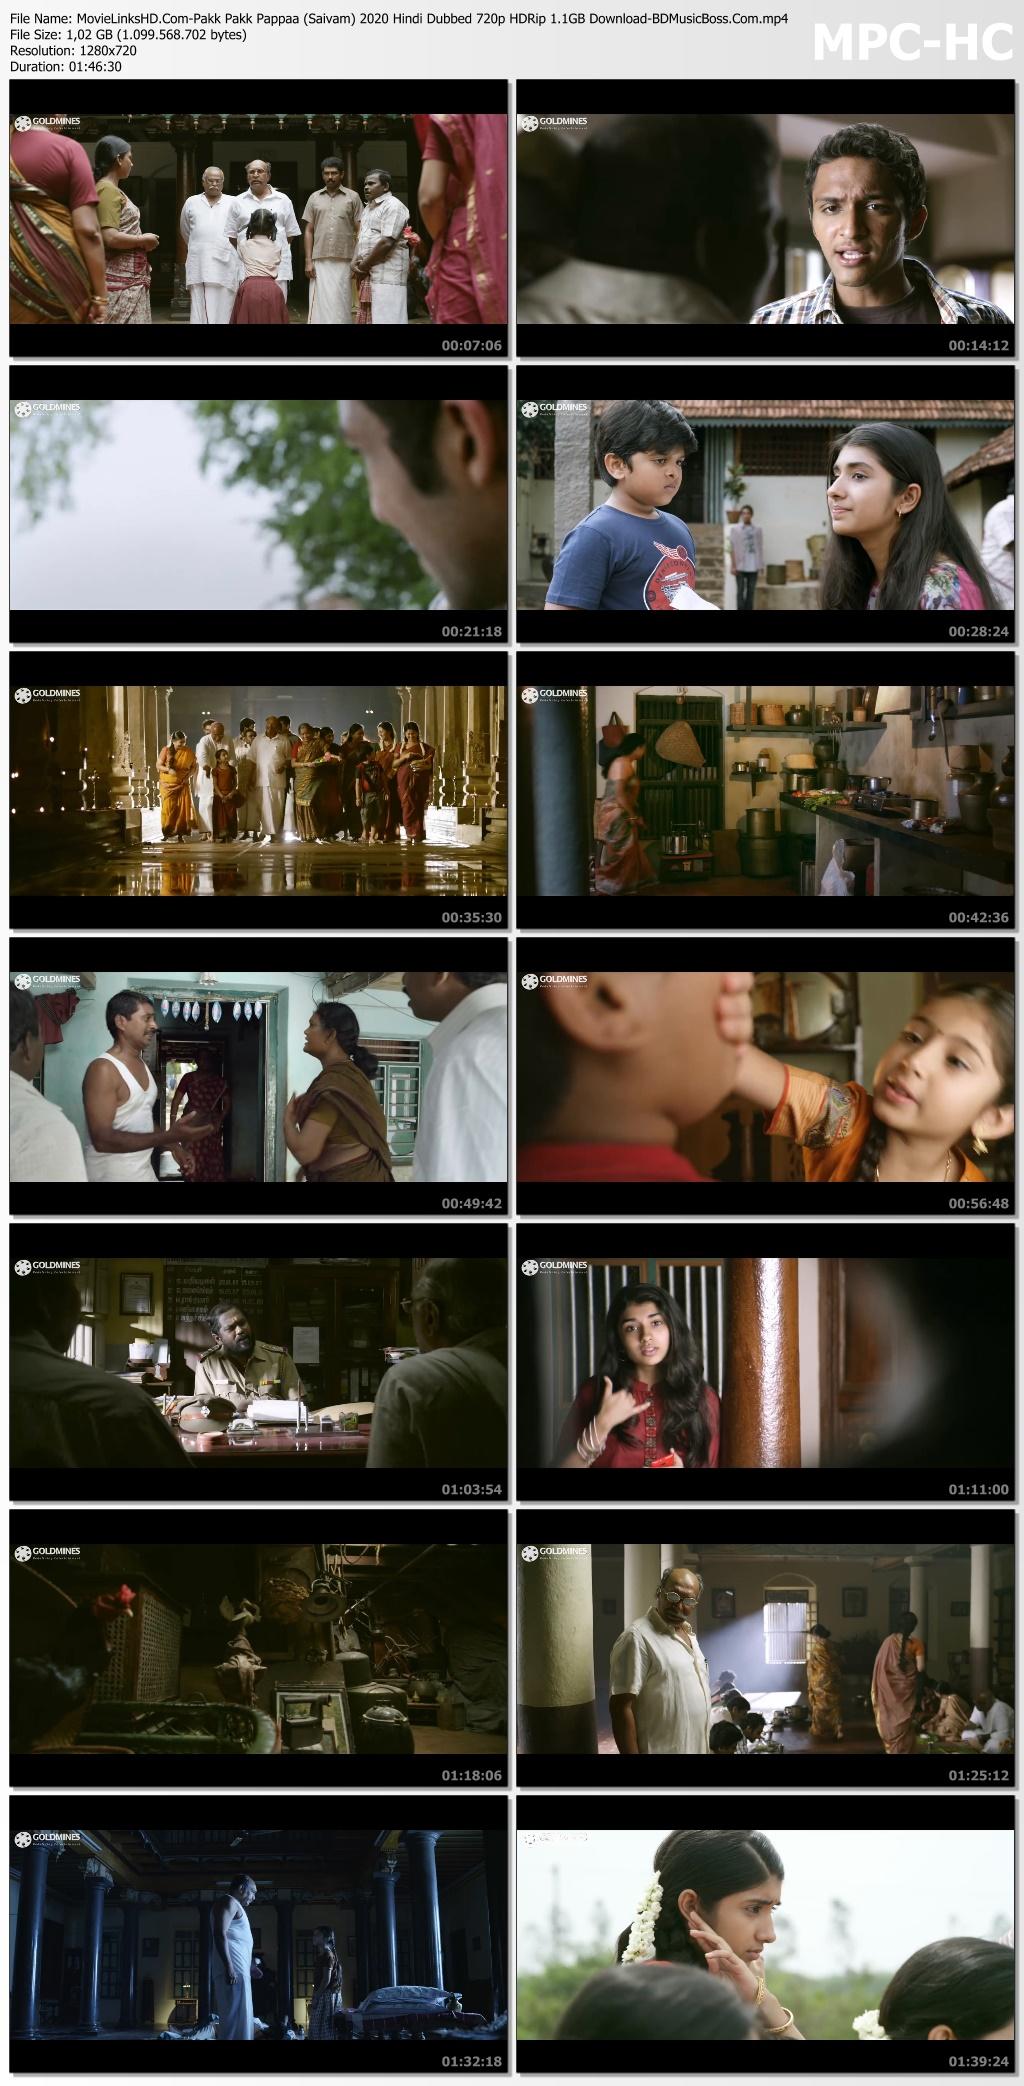 Movie-Links-HD-Com-Pakk-Pakk-Pappaa-Saivam-2020-Hindi-Dubbed-720p-HDRip-1-1-GB-Download-BDMusic-Boss